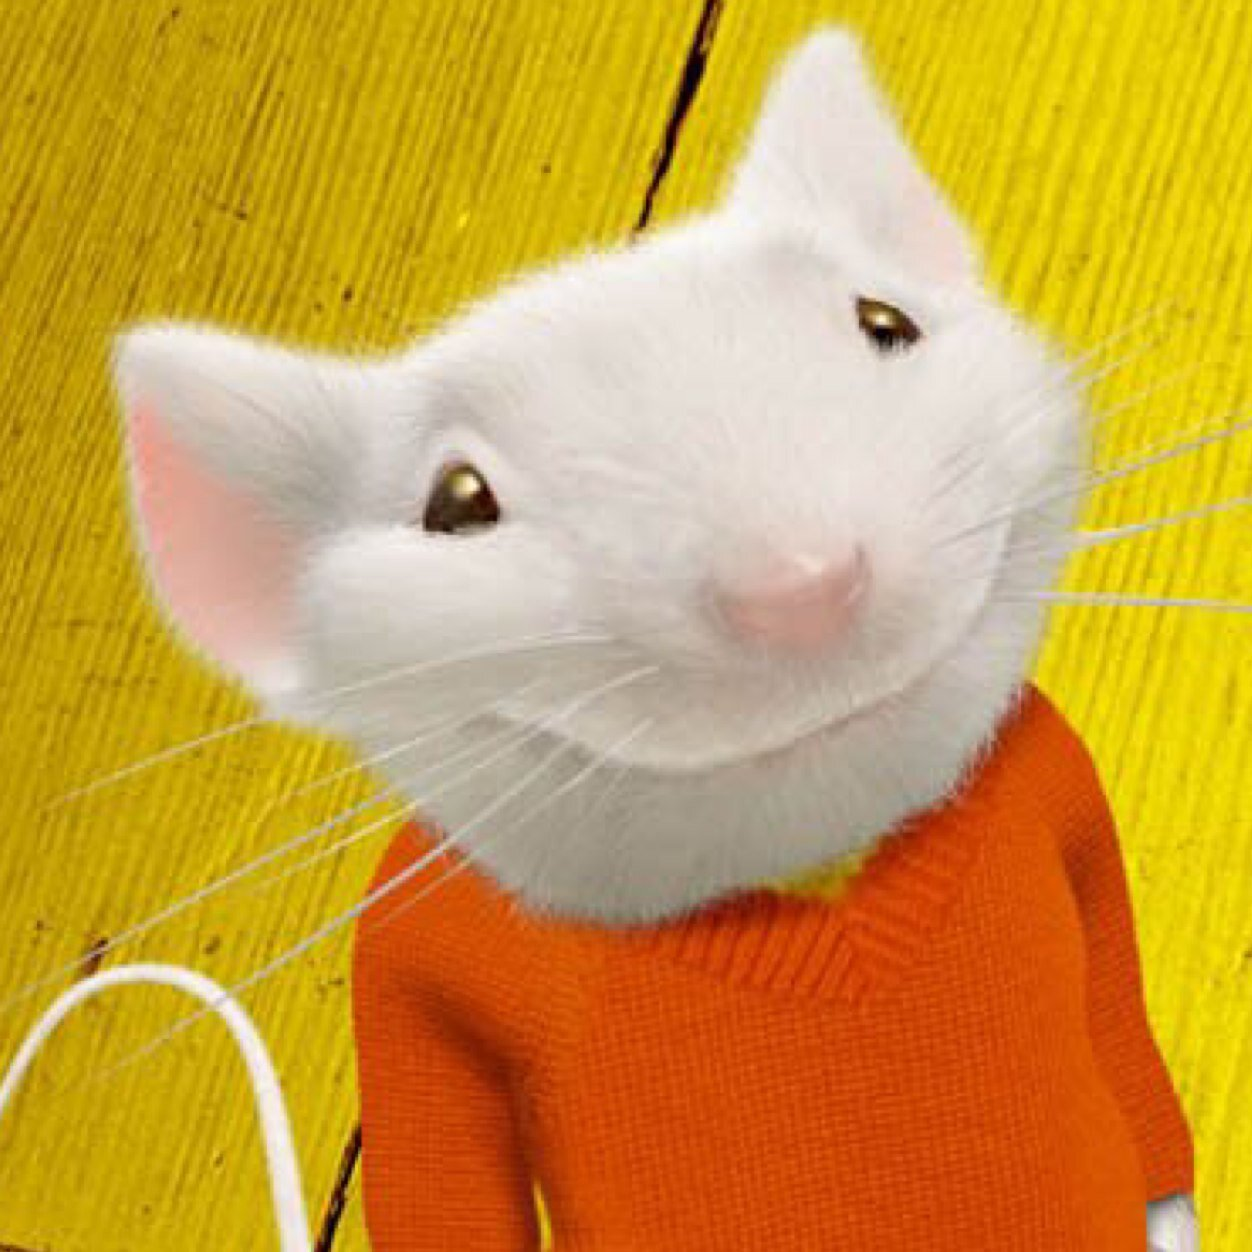 stuart little Stuart little 2 blu-ray (2002): starring michael j fox, geena davis and hugh laurie the mouse stuart little and snowbell set out across town to rescue a friend from a villainous falcon.